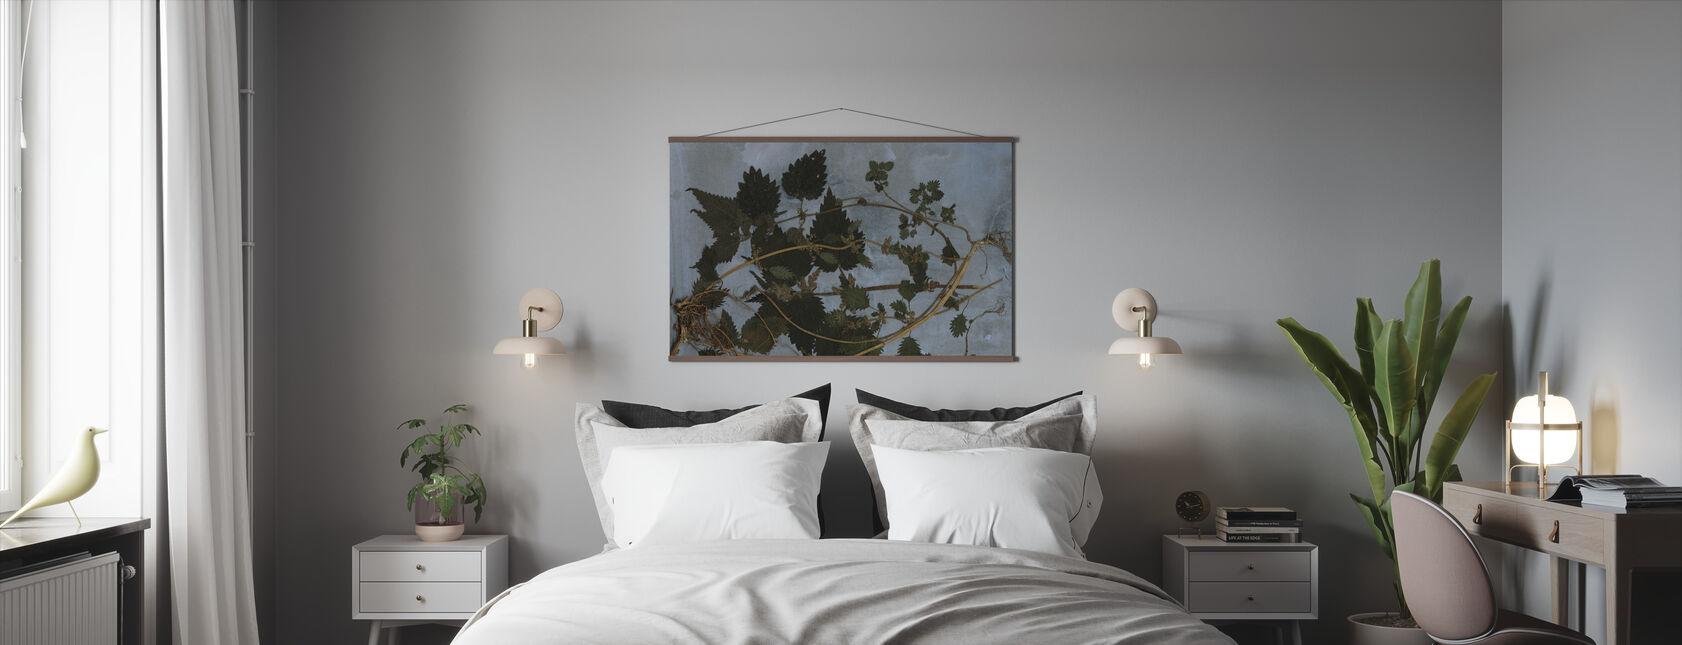 Brandnetels - Poster - Slaapkamer